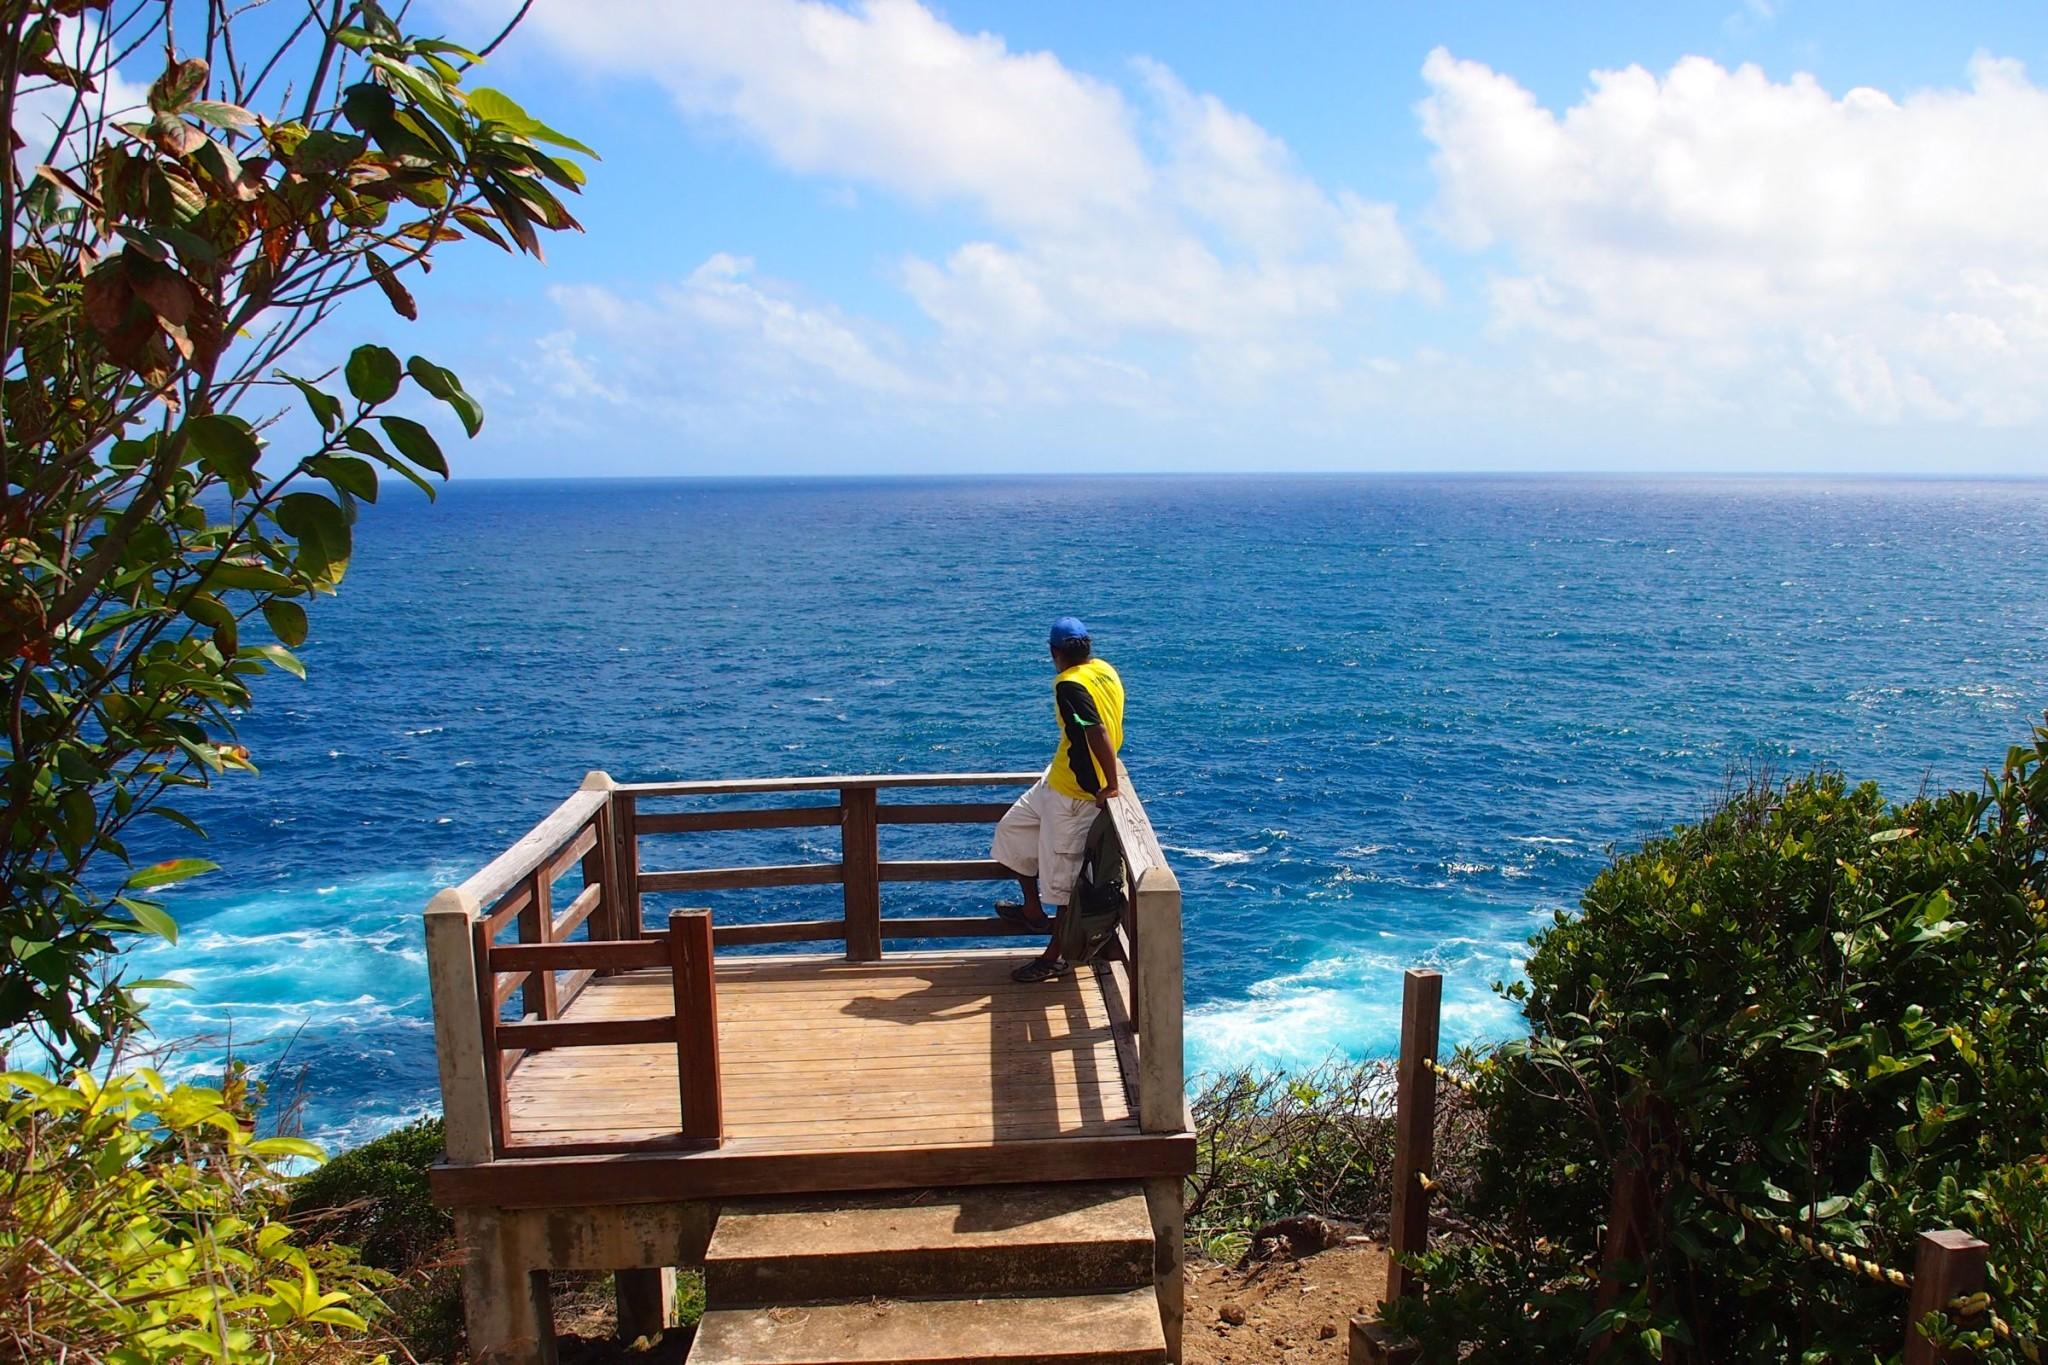 Mystical L'Escalier Tête Chien, Dominica: Uncommon Attraction